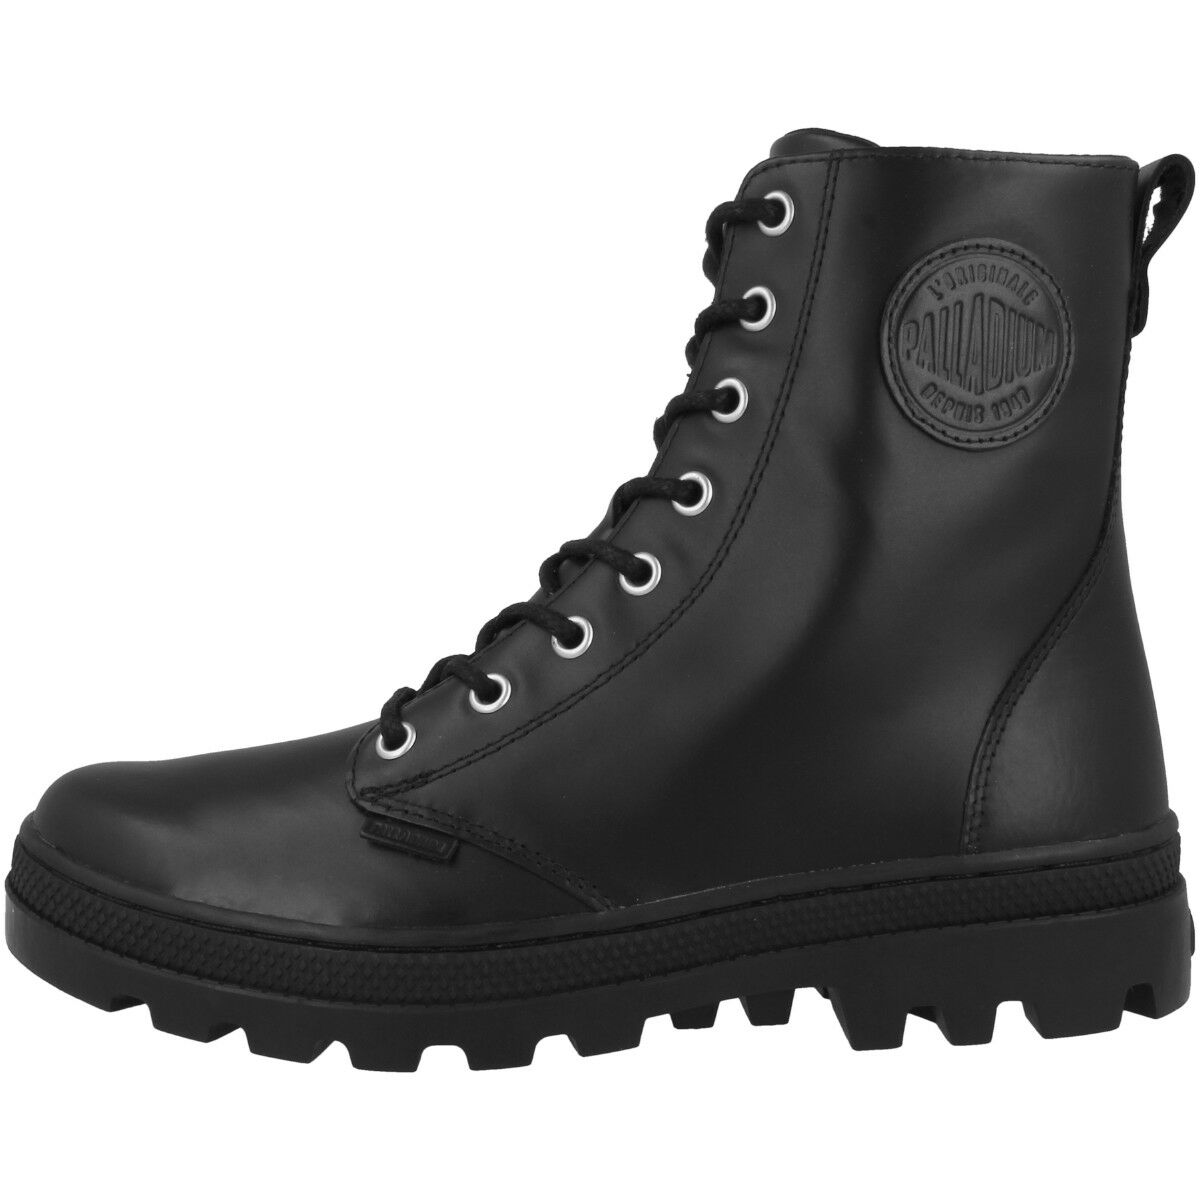 Palladium pallabosse off High Leather zapatos  High off Top Mujer cortos Botas 95527008 798d77